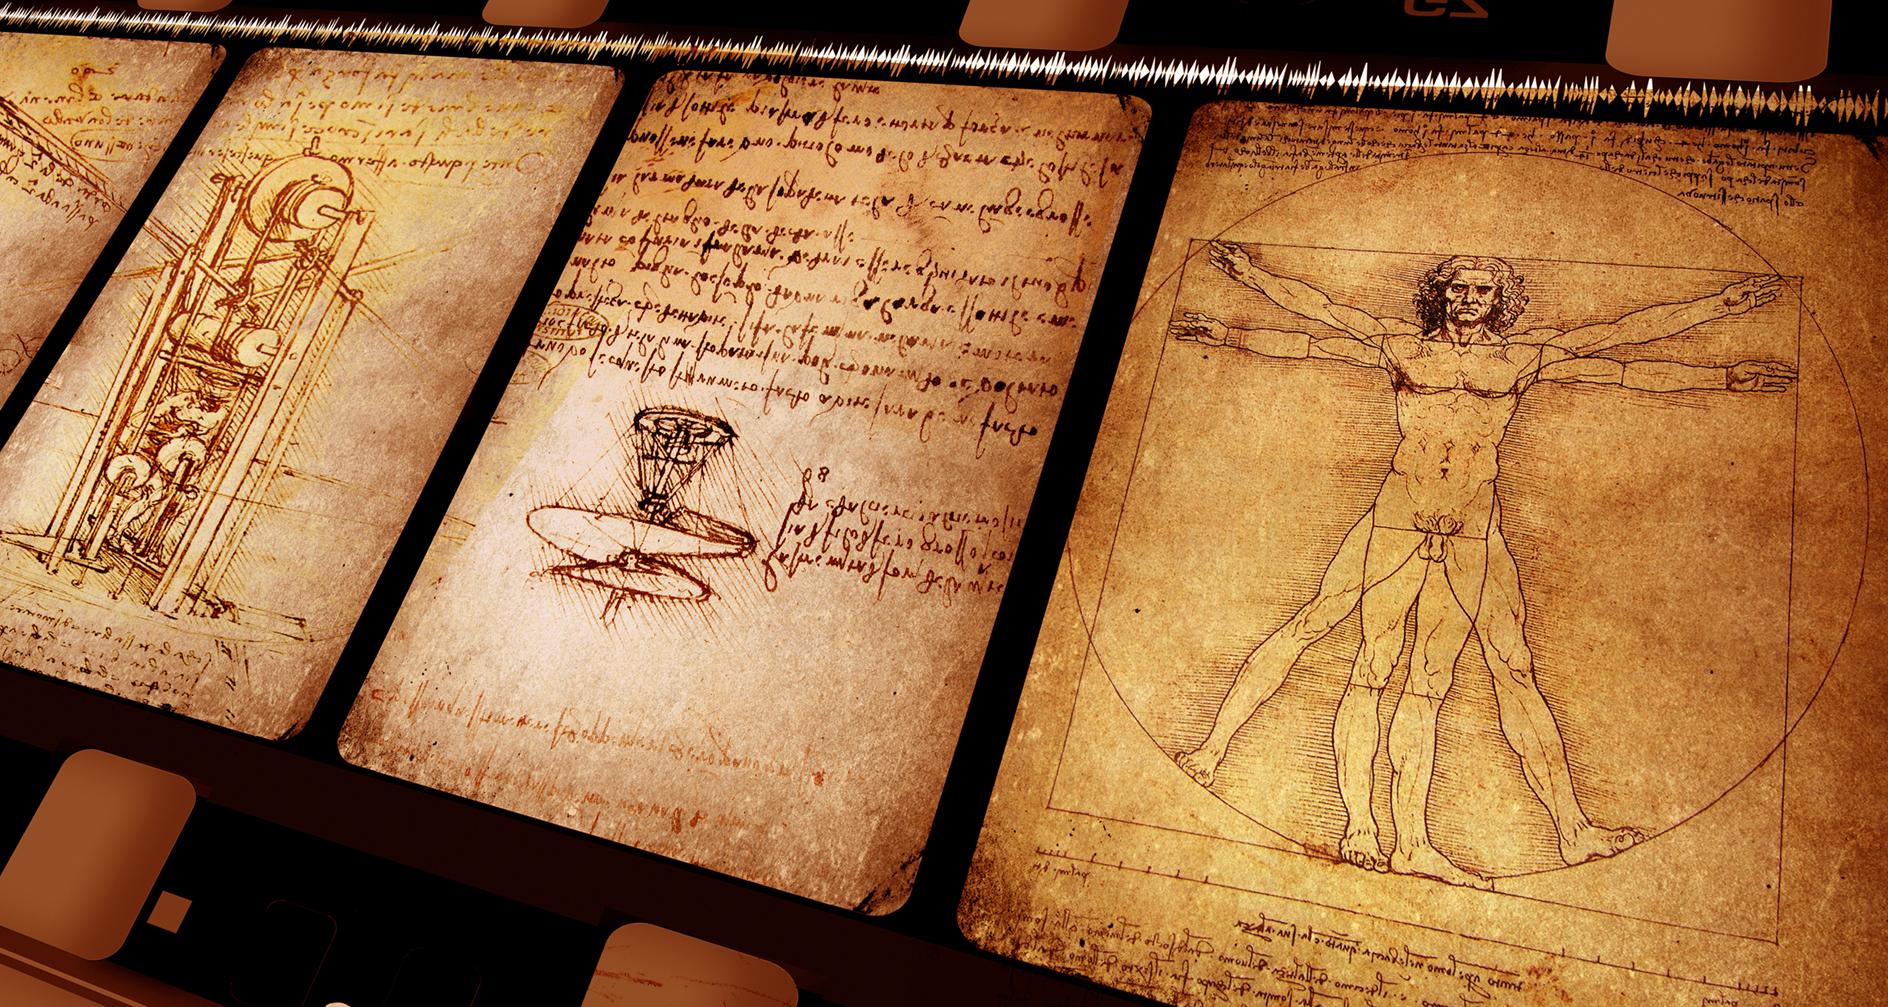 Leonardo da Vinci was a generalist